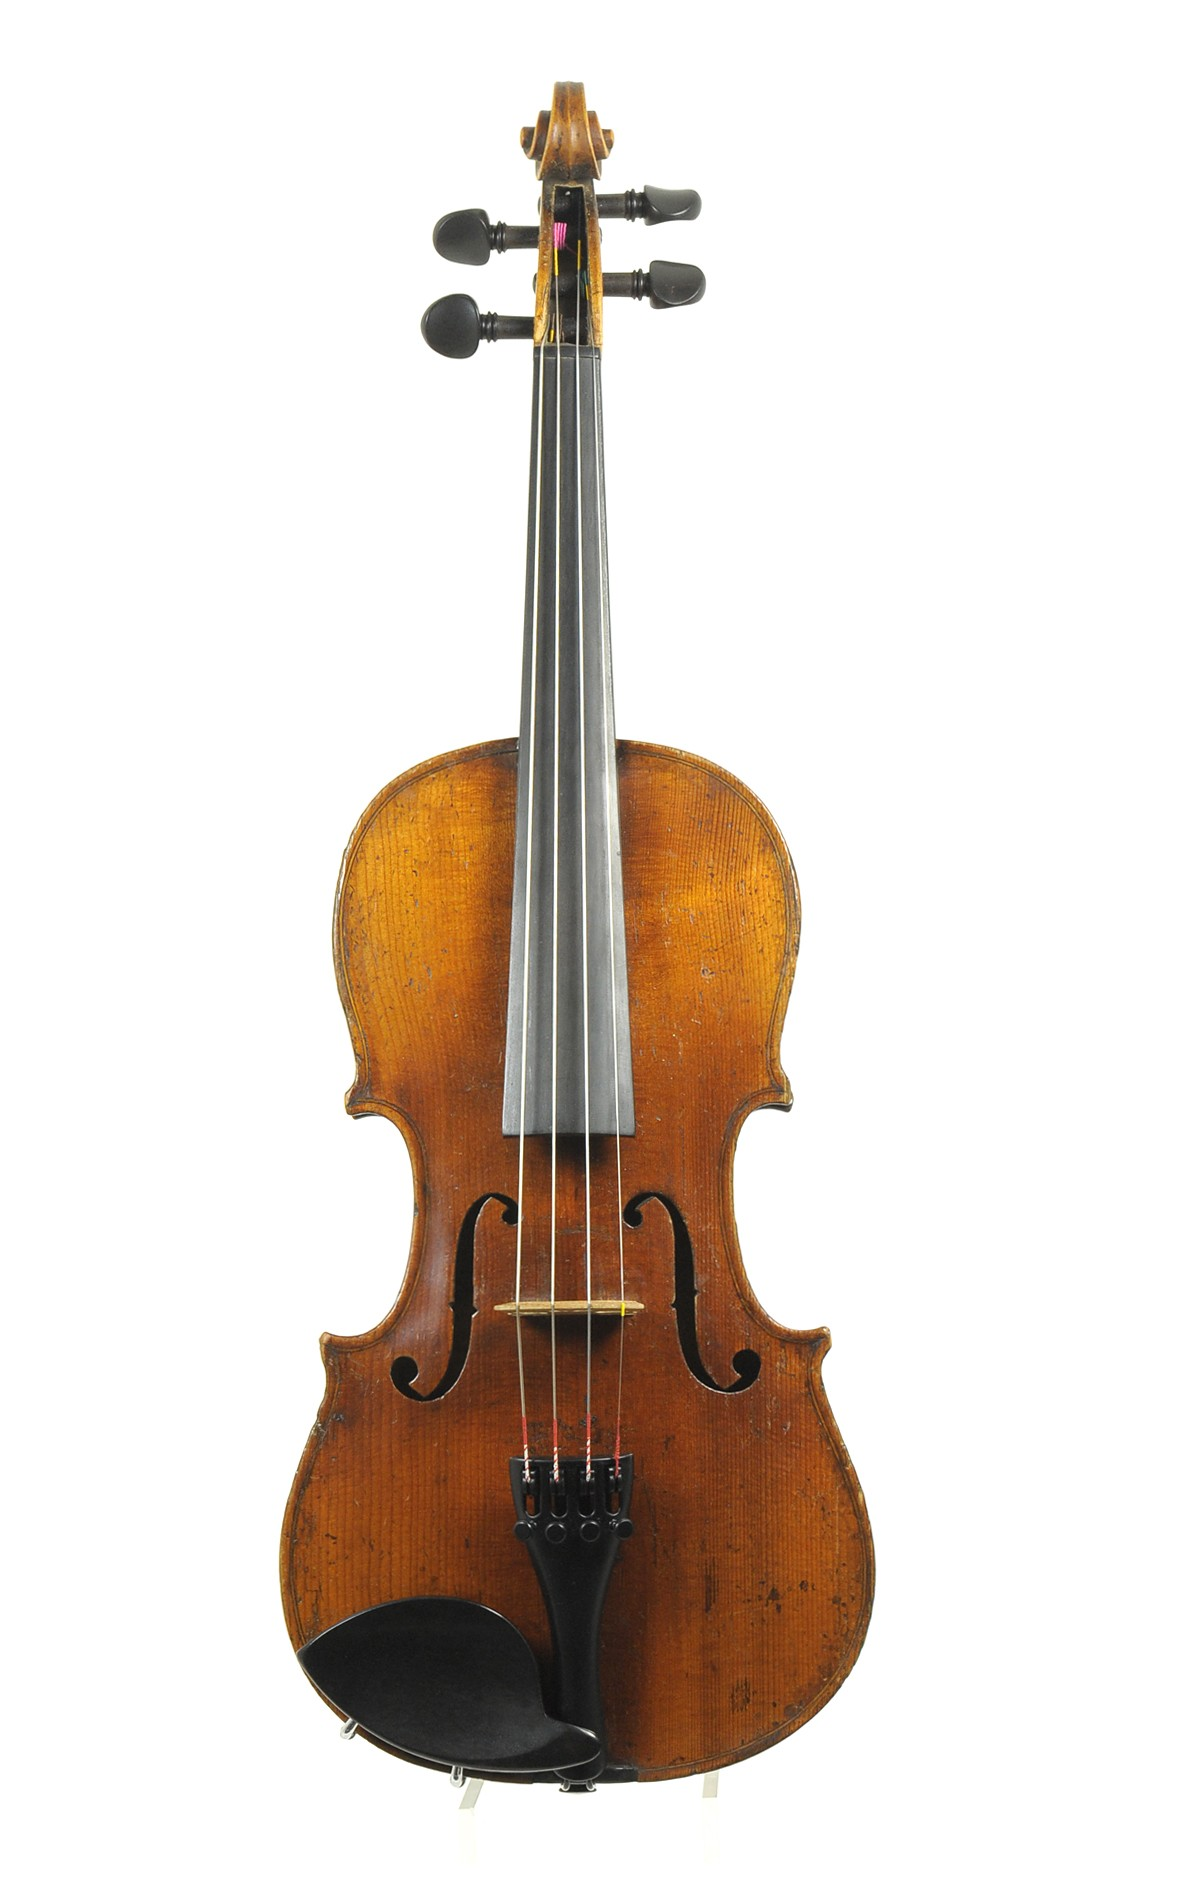 3/4 violin, Hopf workshop Klingenthal, 19th century